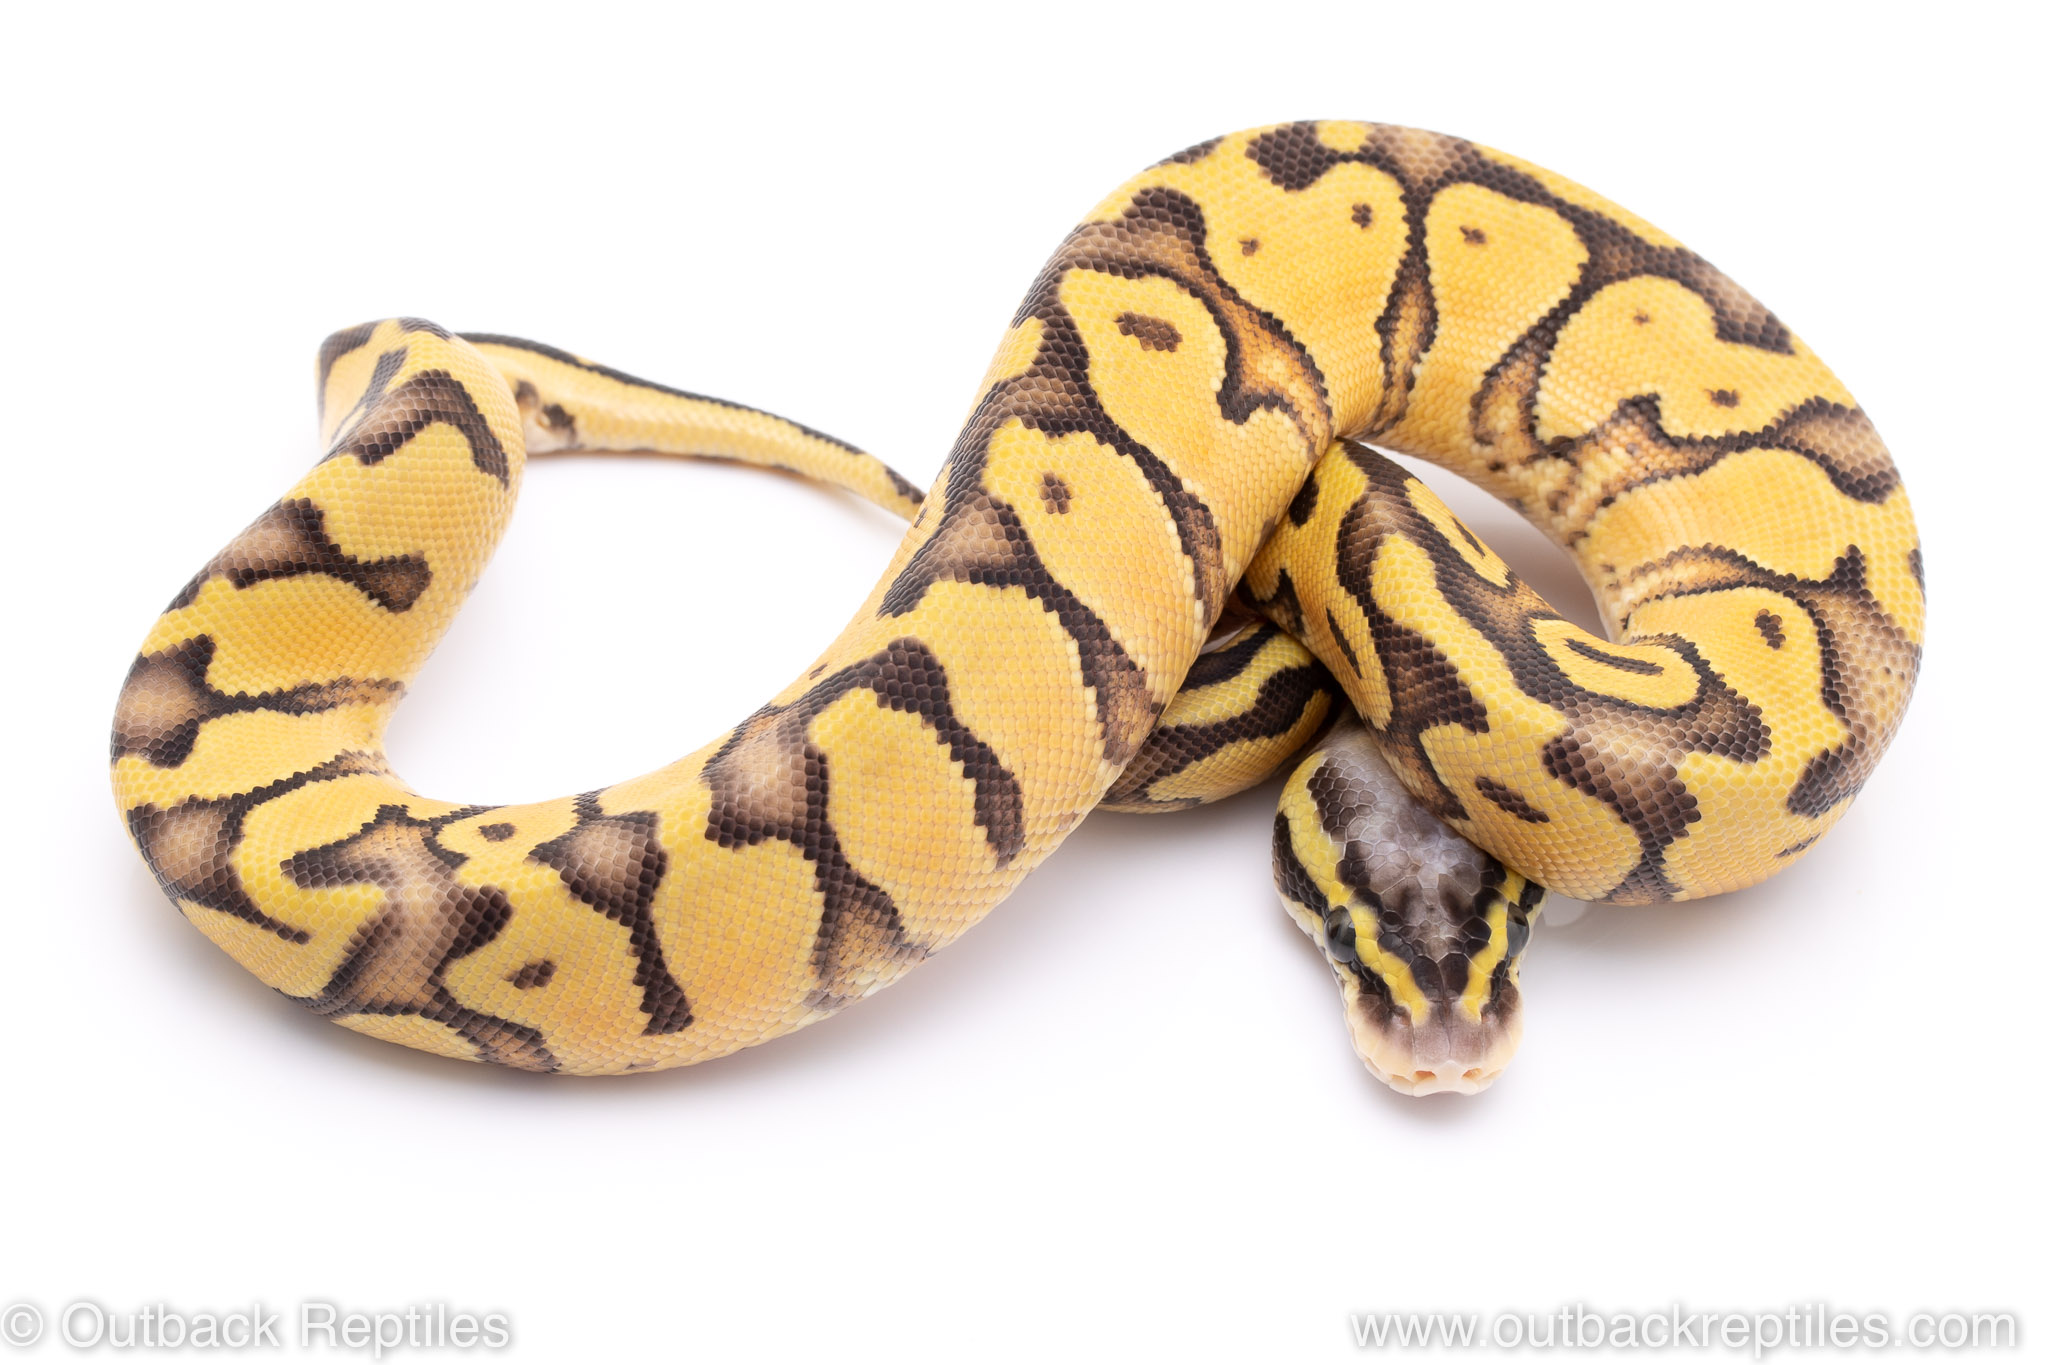 Super Pastel Enchi ball python for sale